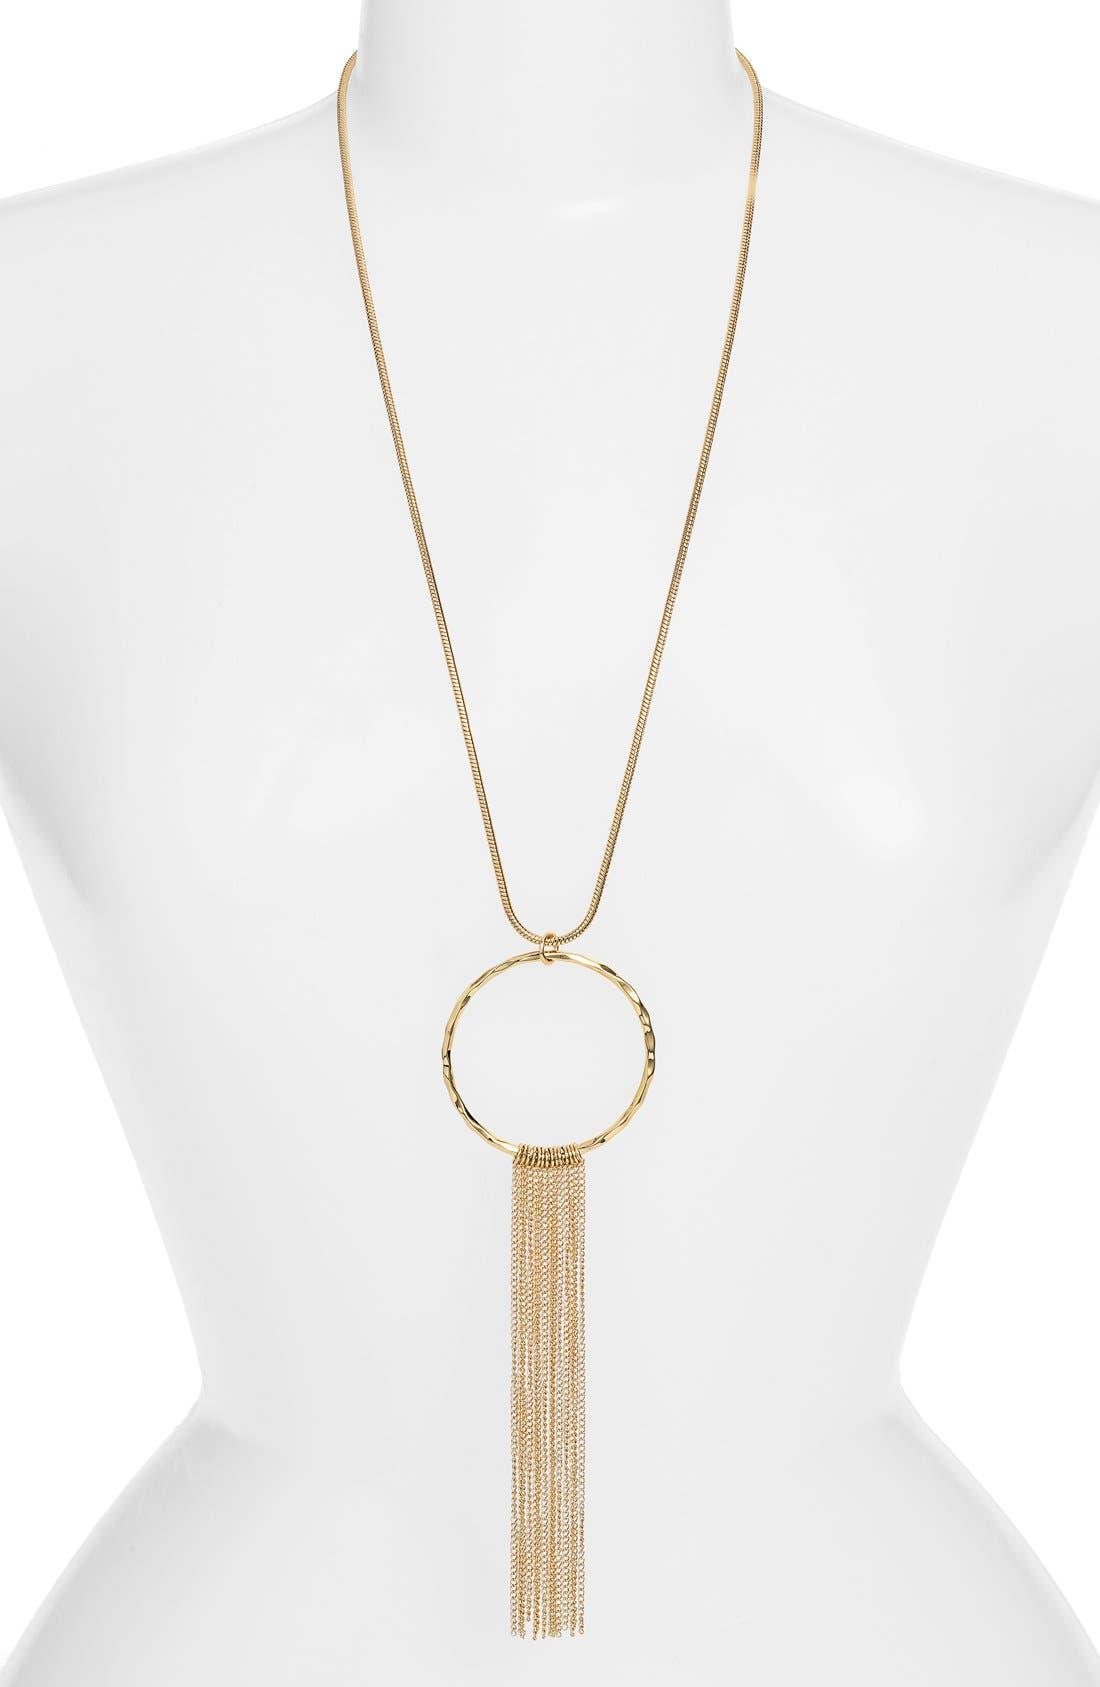 Alternate Image 1 Selected - Jules Smith 'Oslo' Tassel Pendant Necklace